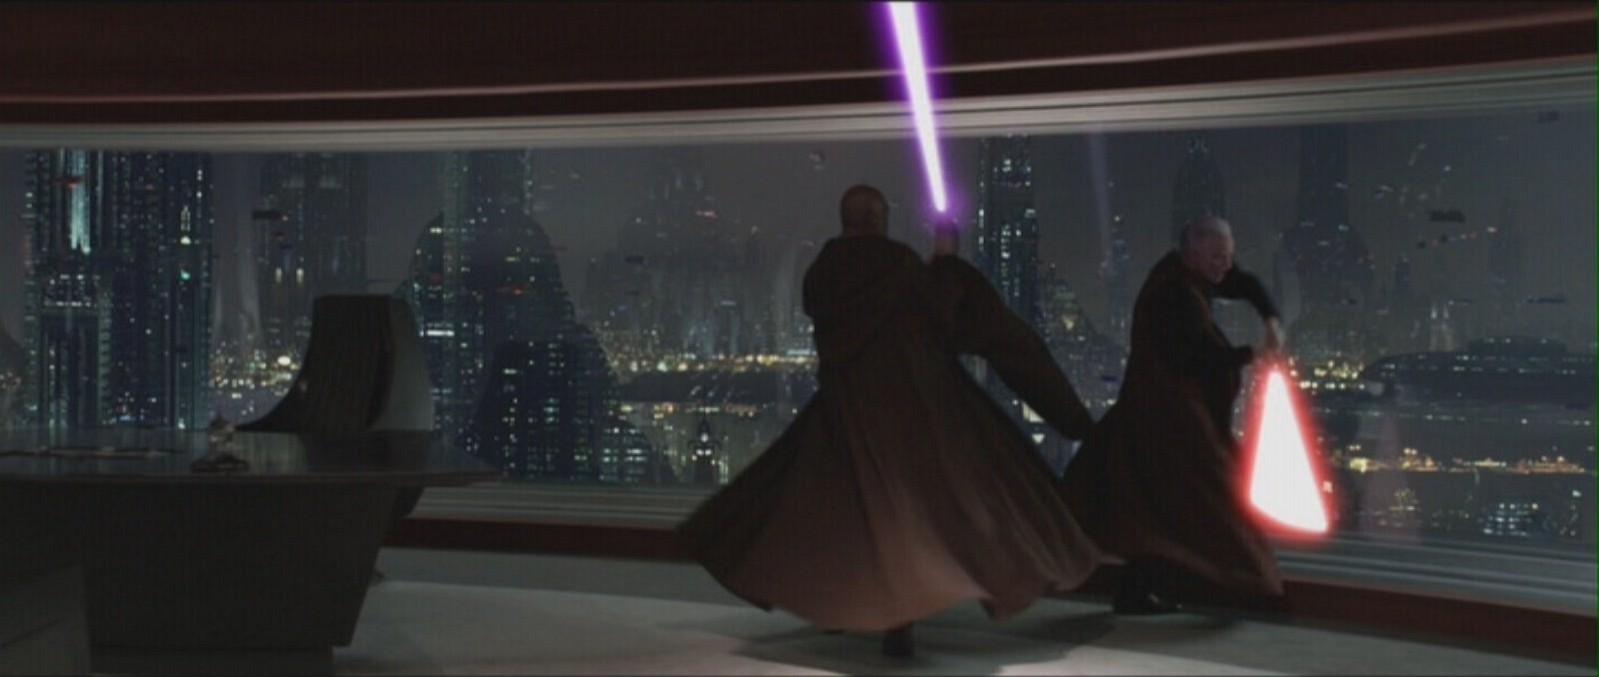 Star Wars Revenge Of The Sith Mace Windu Image 12176808 Fanpop